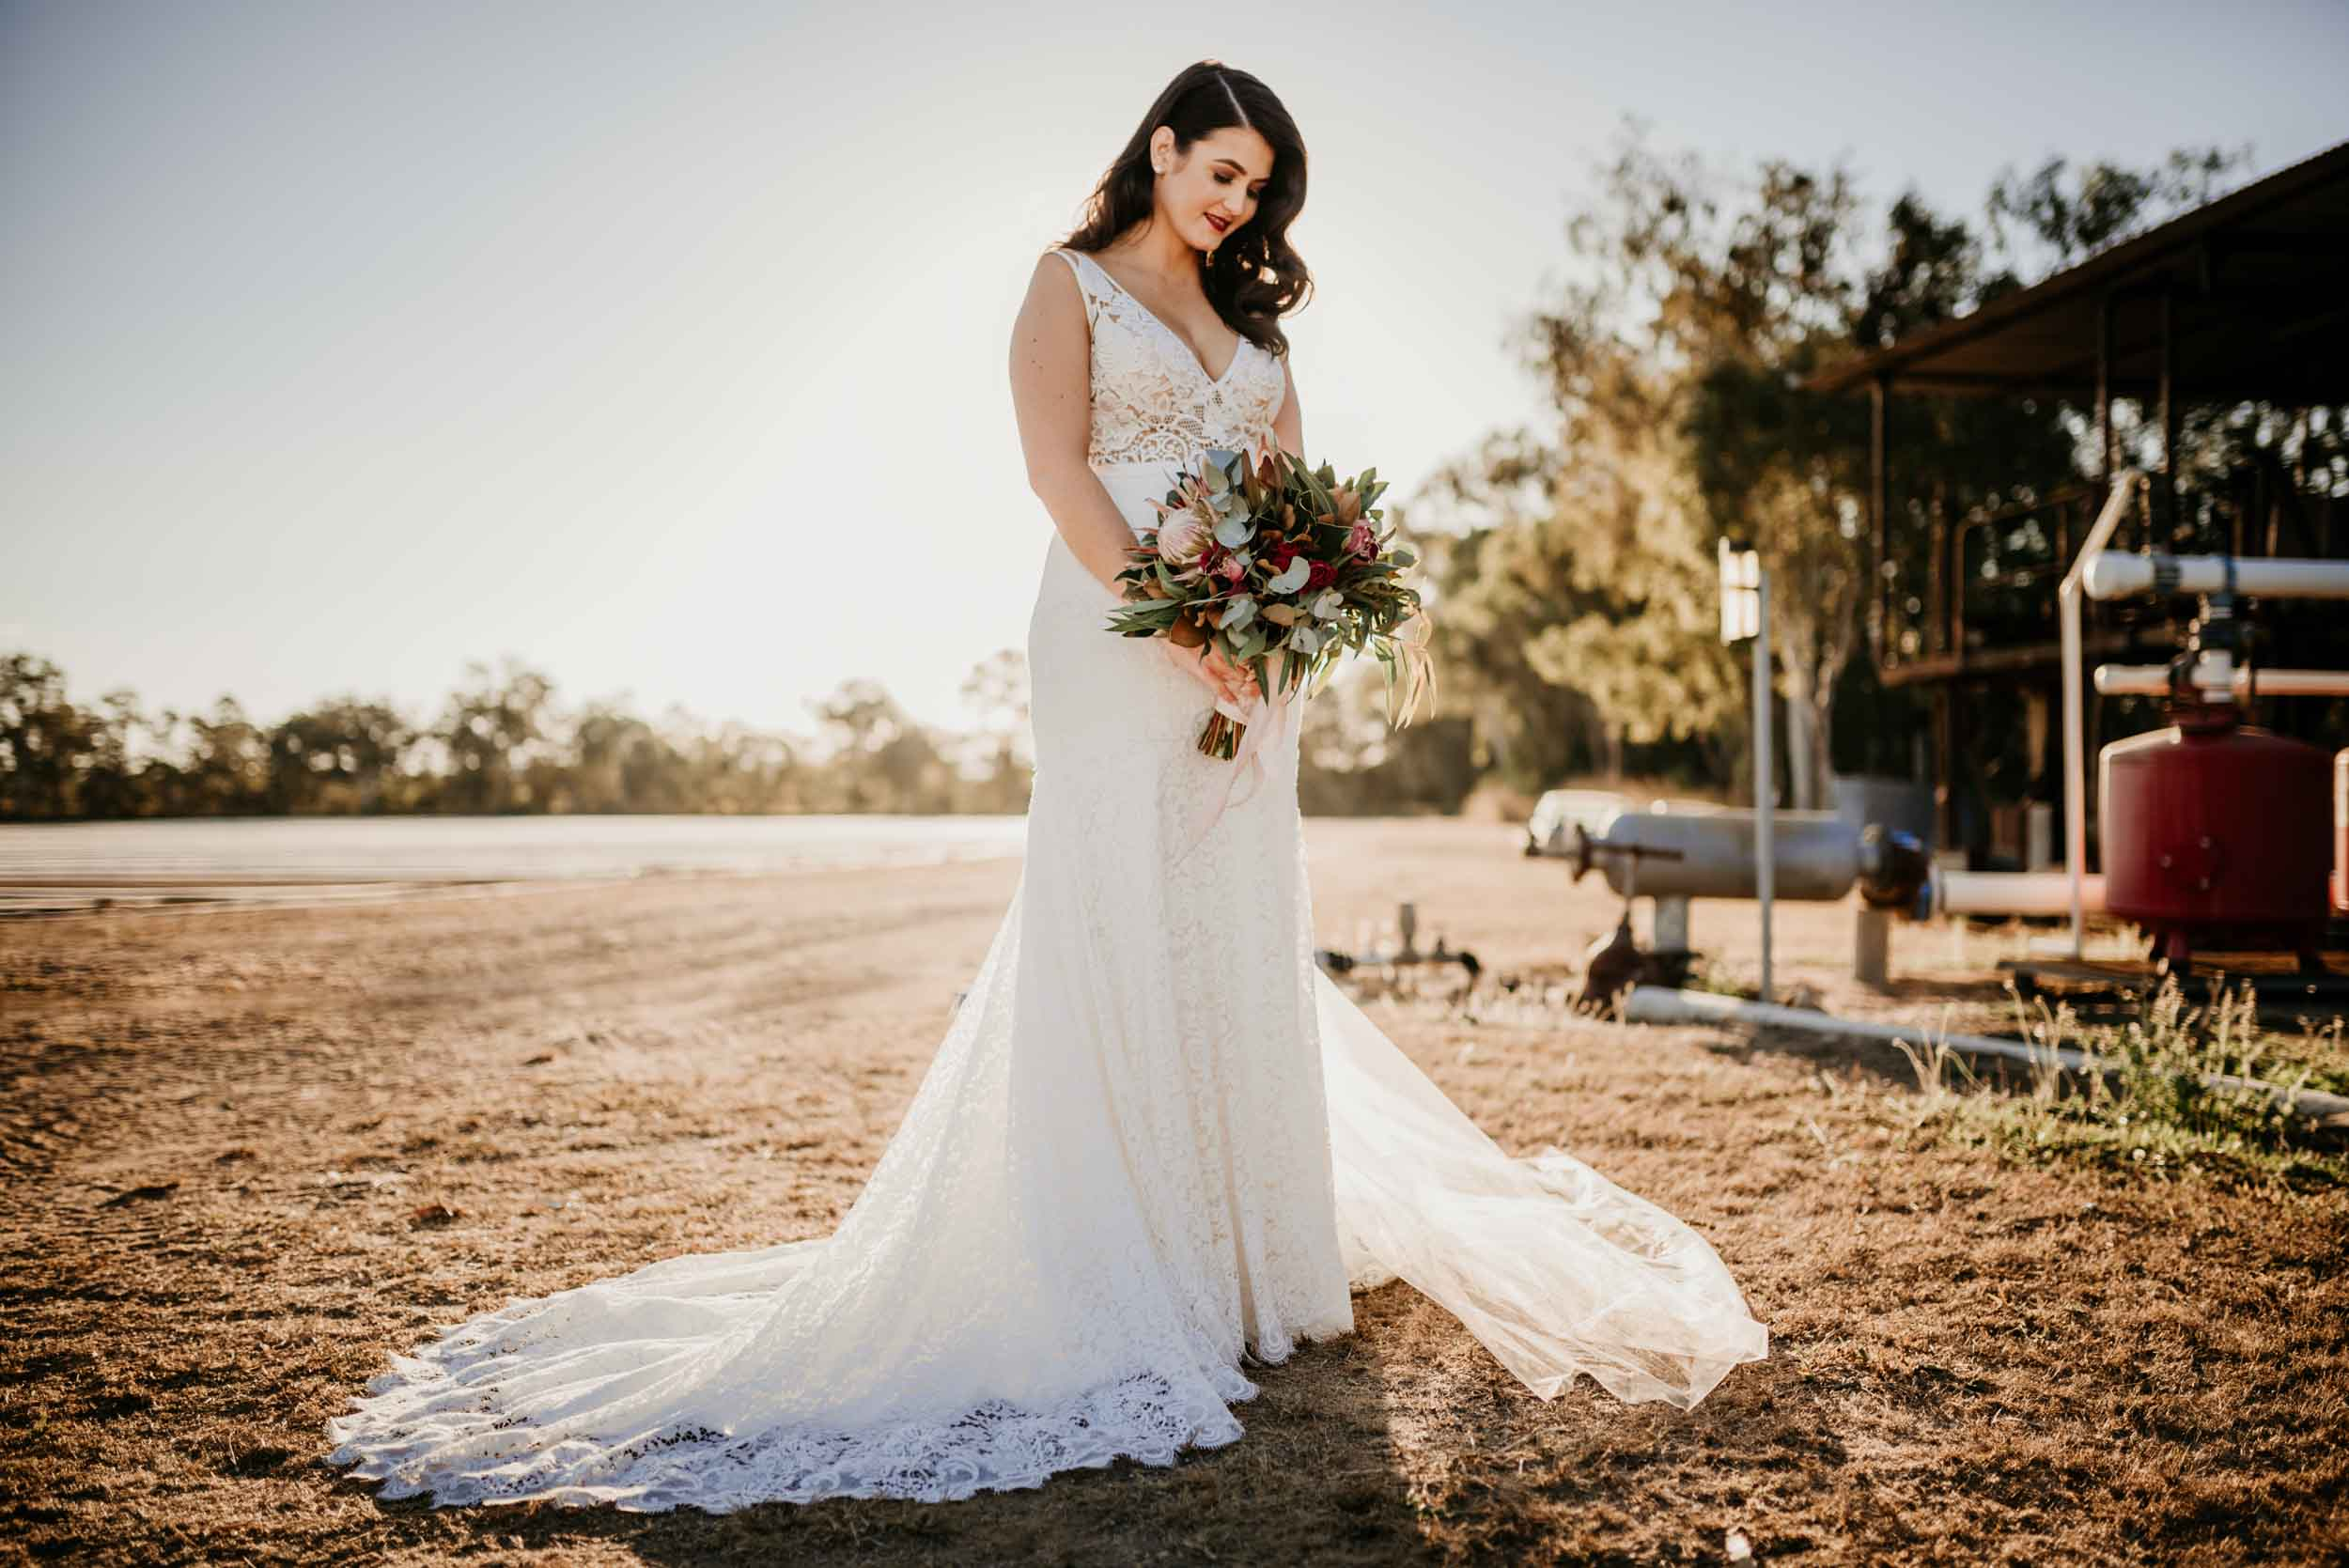 The Raw Photographer - Cairns Wedding Photographer - Atherton Tablelands - Mareeba farm Wedding - Irene Costa's Devine Bridal - Candid - Photo Package-41.jpg